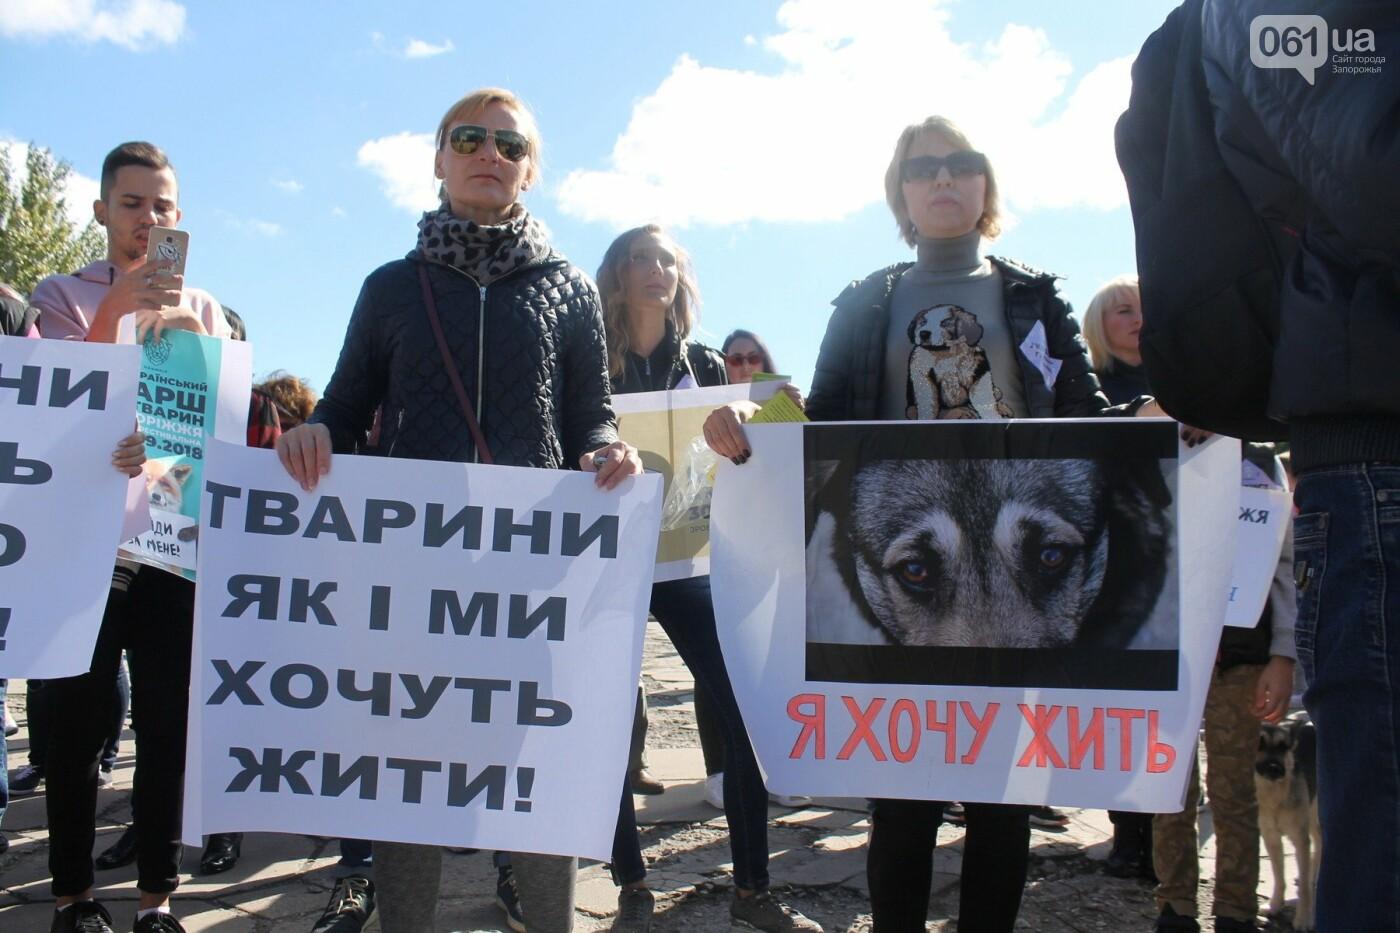 «Защити! Не мучай»: в Запорожье провели марш за права животных, – ФОТОРЕПОРТАЖ, ВИДЕО, фото-8